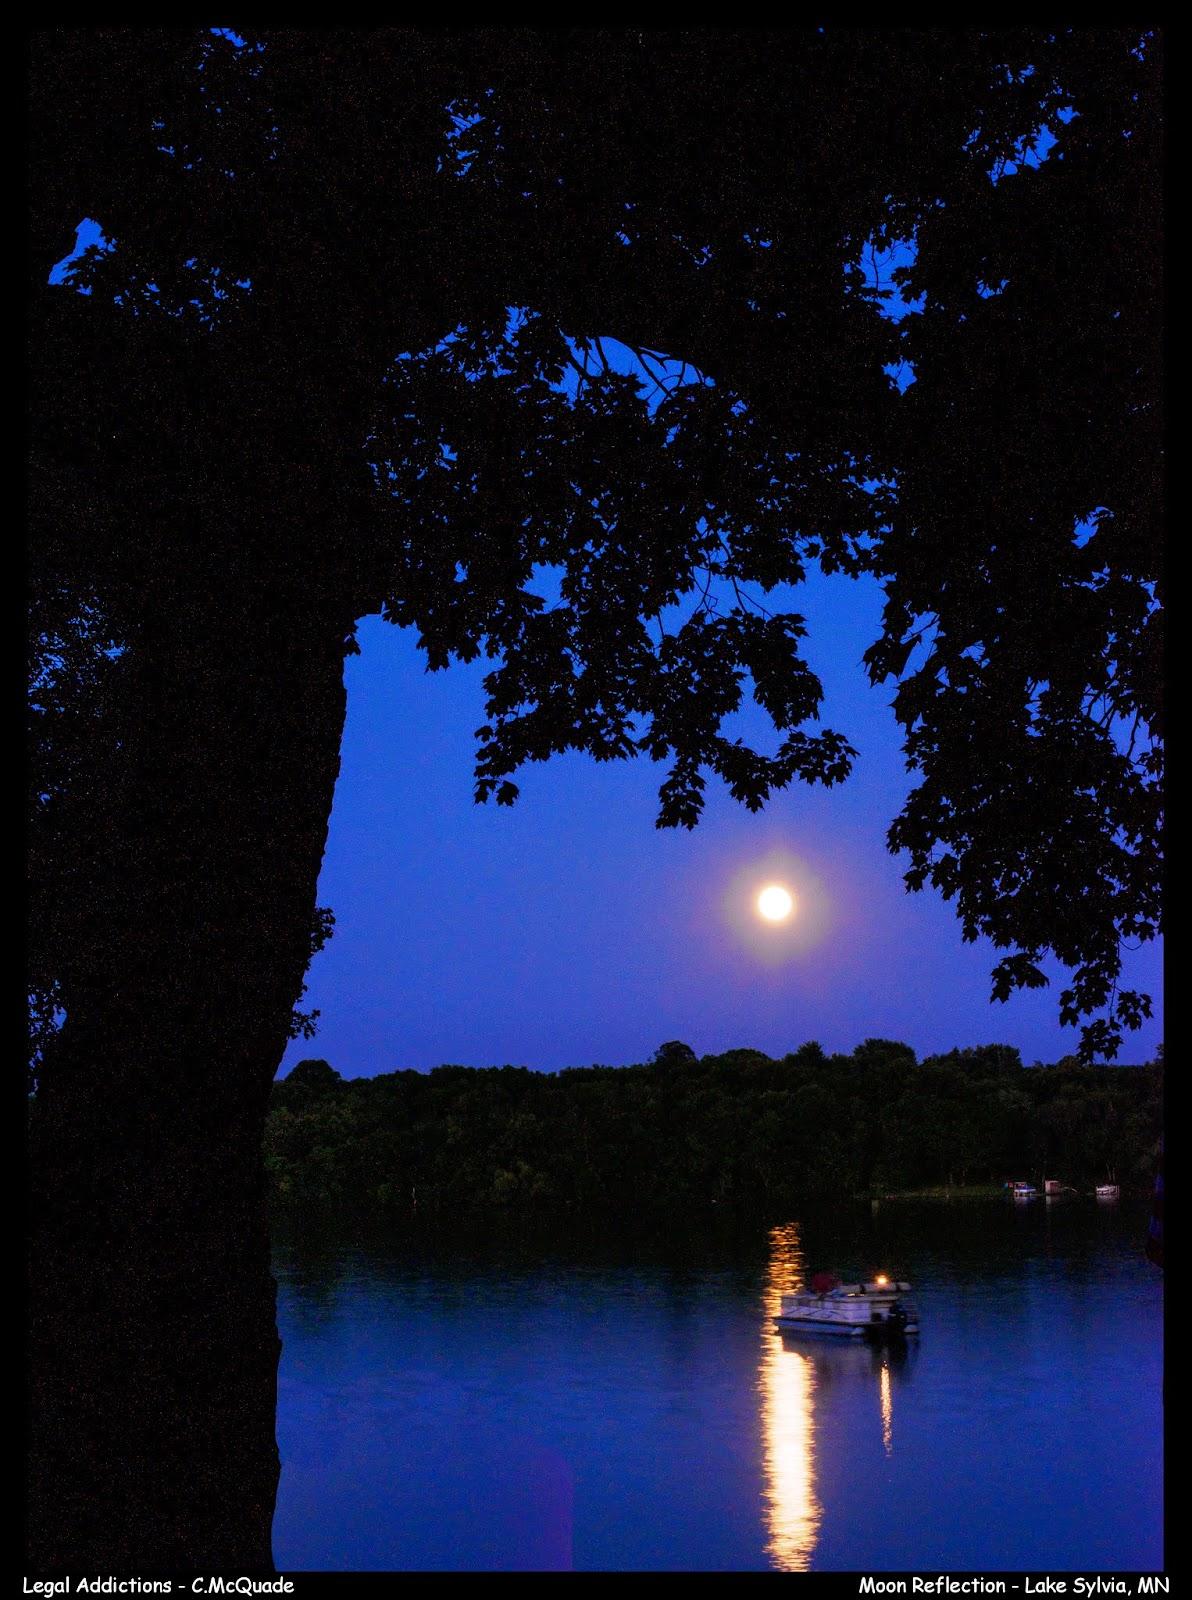 super+moon+lake+sylvia-20144436.jpg